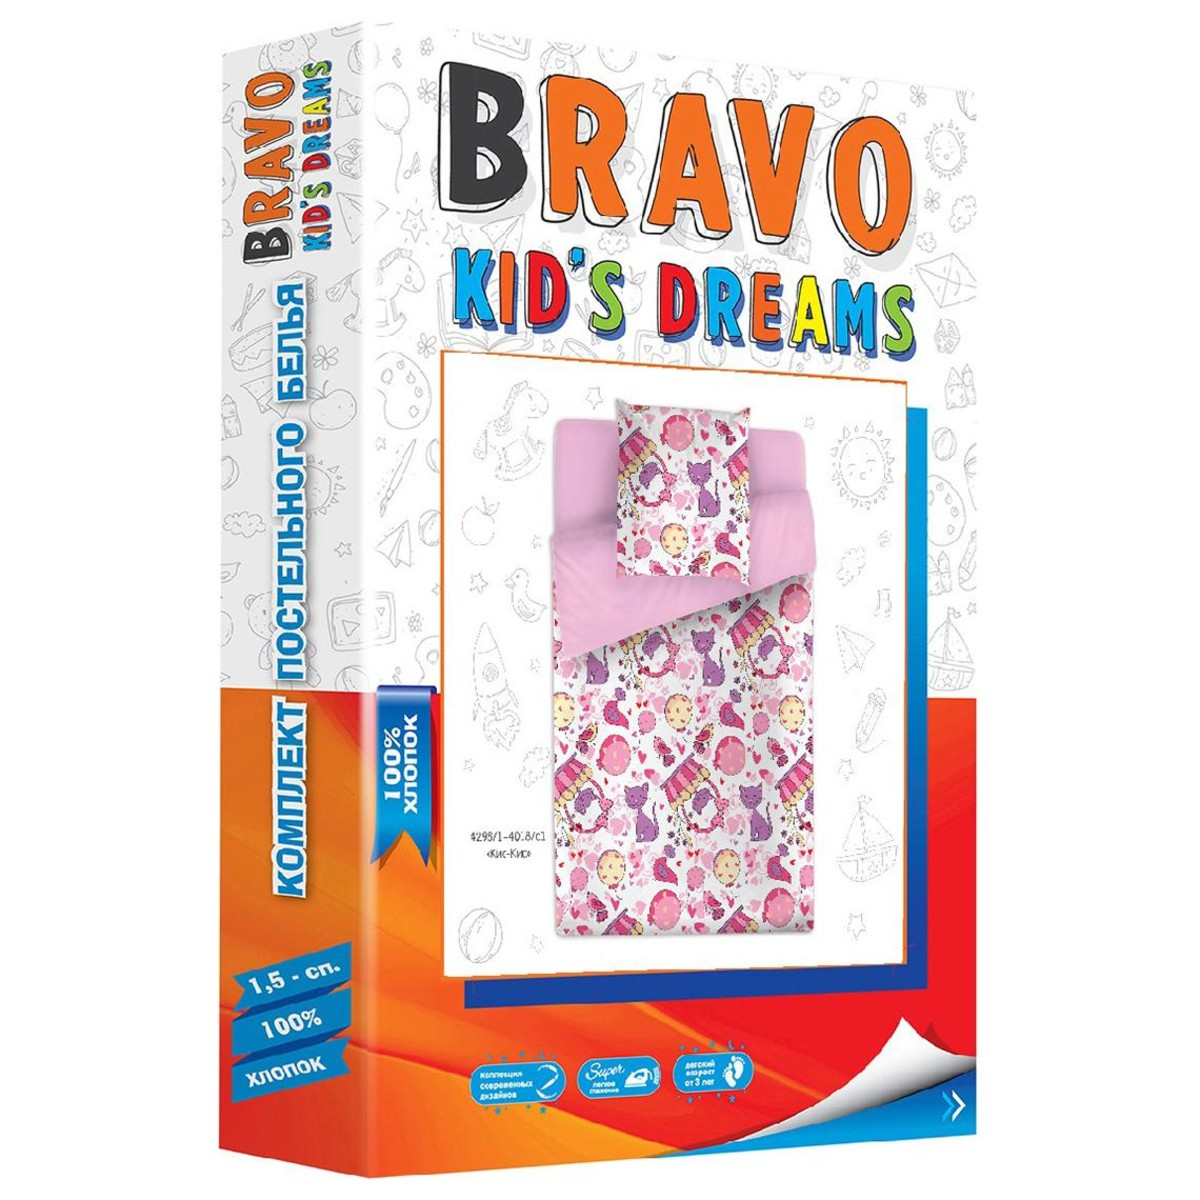 Комплект Постелього Белья Bravo Kids Dreams Кис-Кис 107071 Поплин 3 Предмета